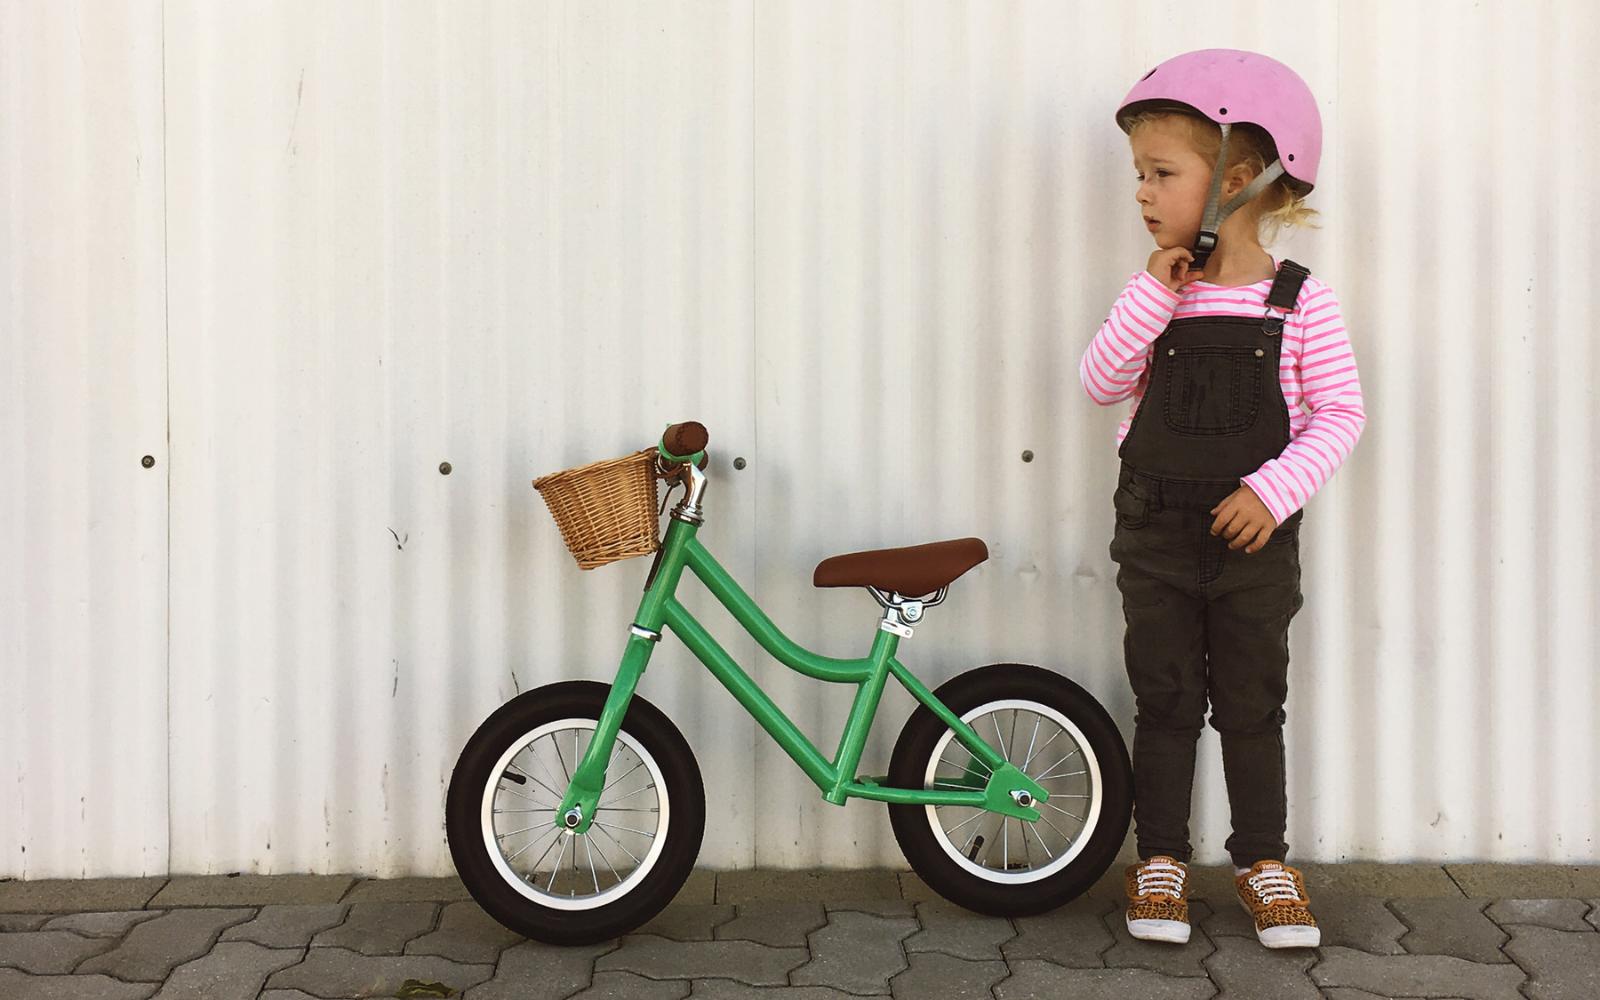 Lifestyle Images 1600 x 1000 2 2 - Reid ® - Girls Vintage Balance Bike